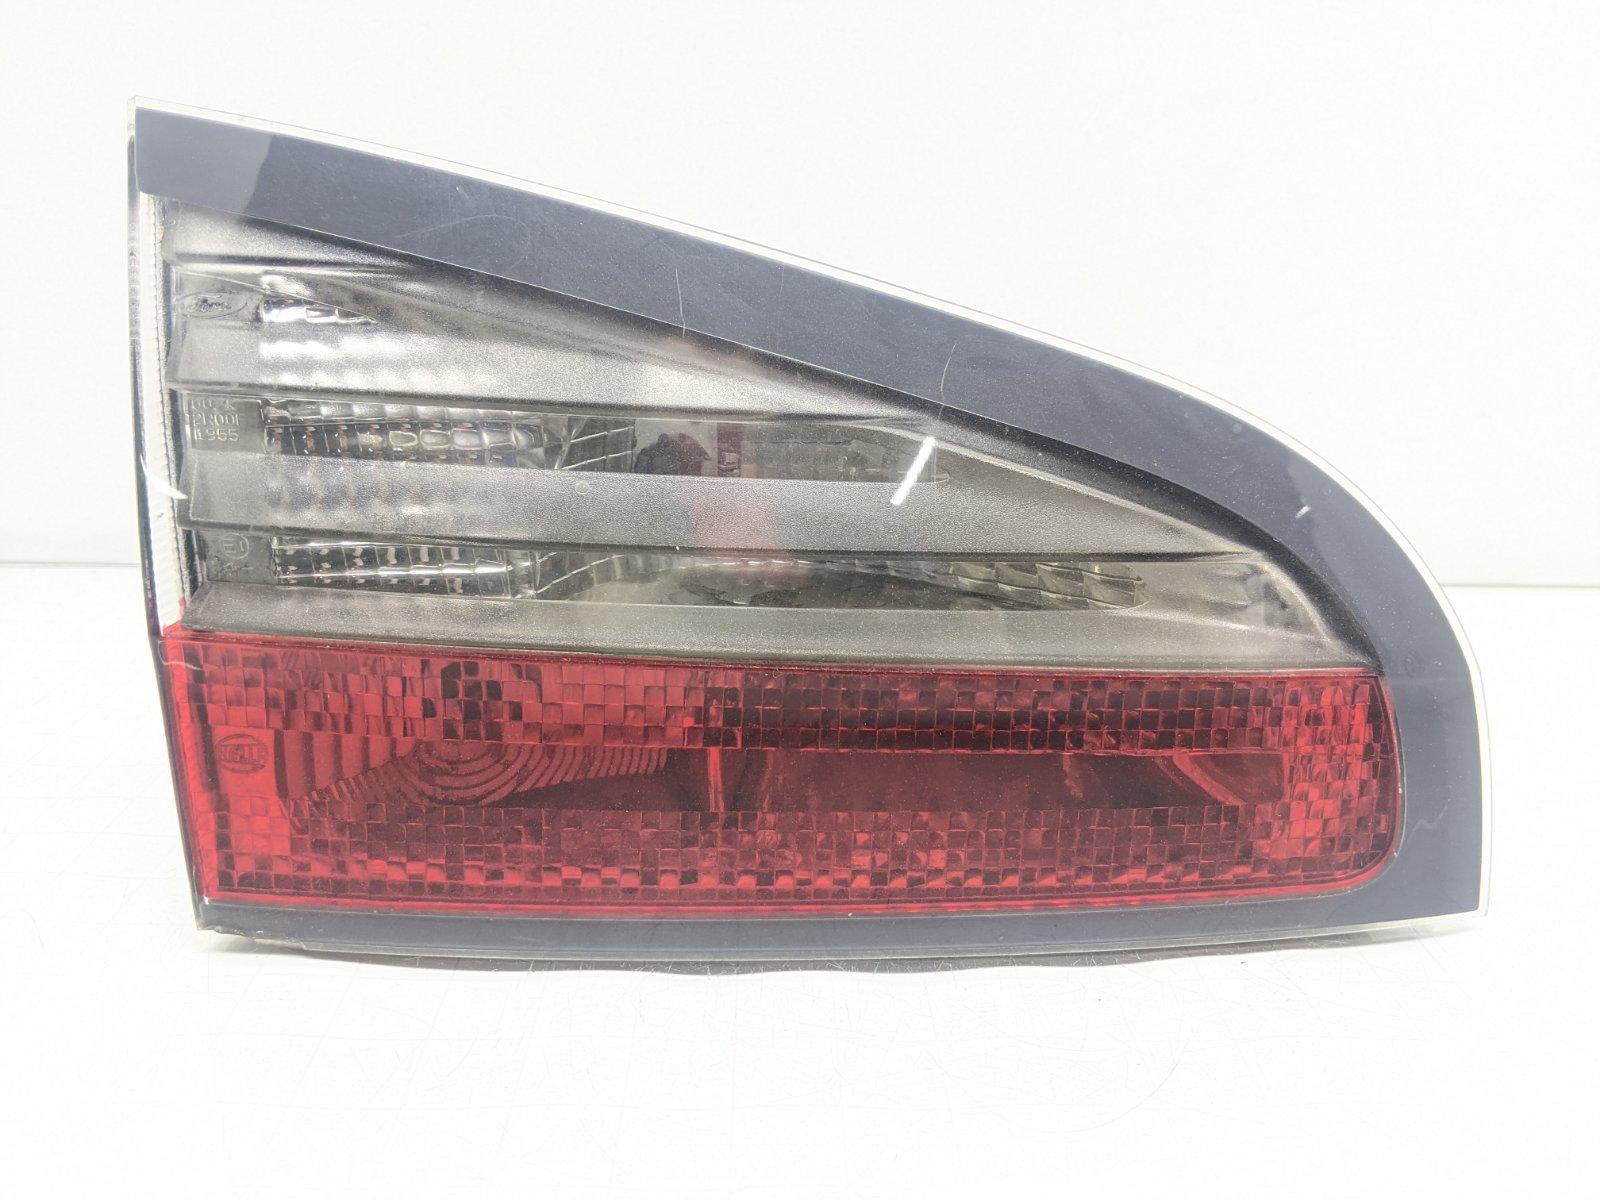 Фонарь крышки багажника левый Ford S-Max 1.8 TDCI 2008 (б/у)